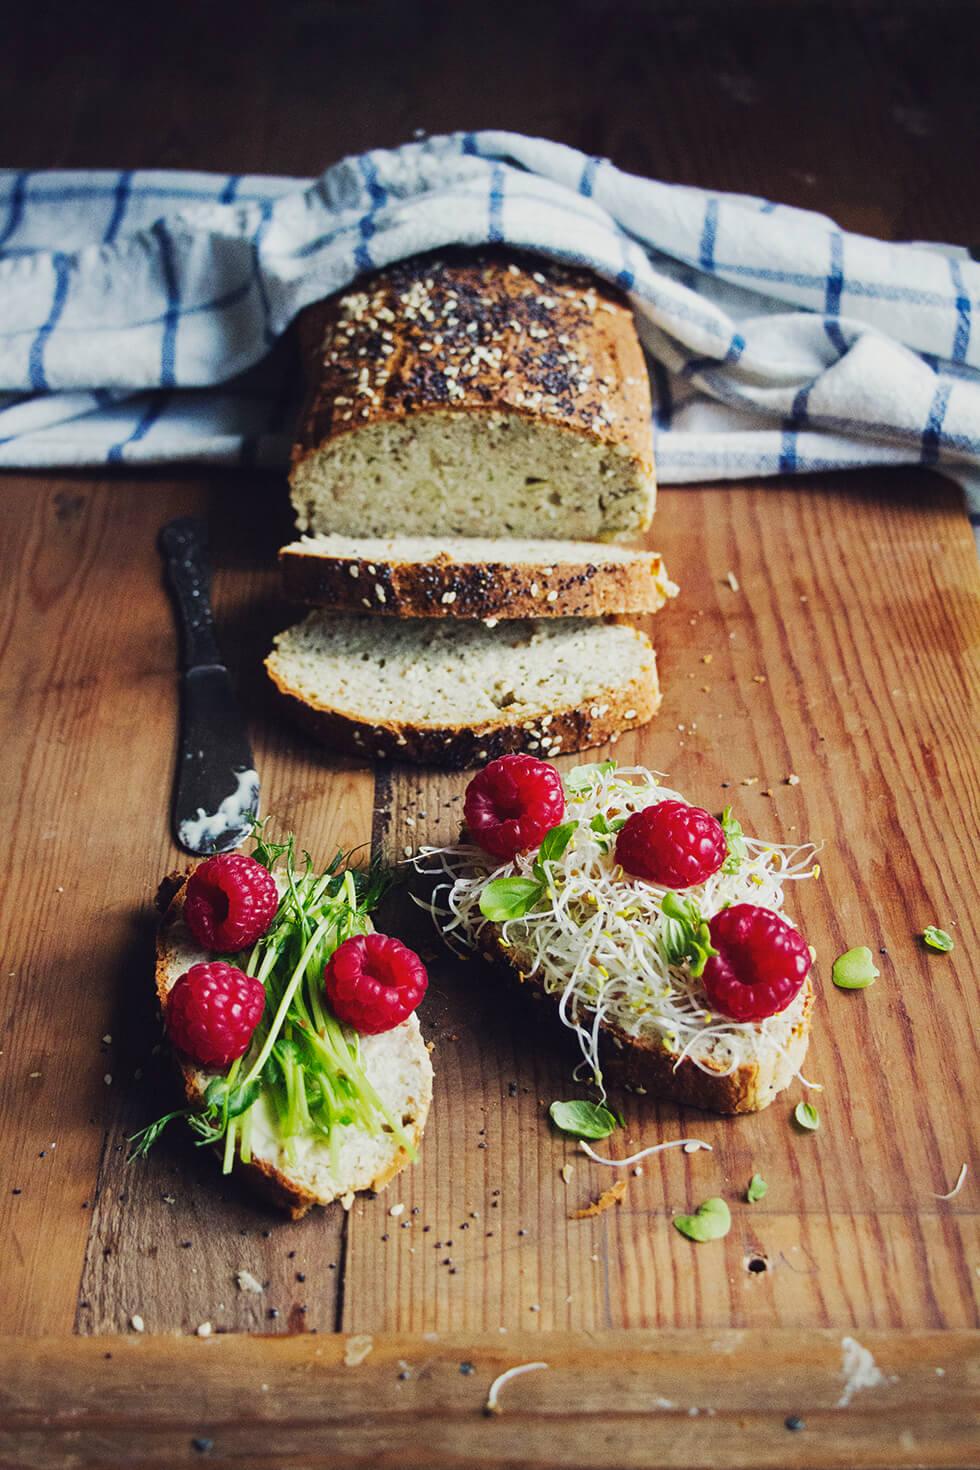 lättbakat grovt bröd utan jäst